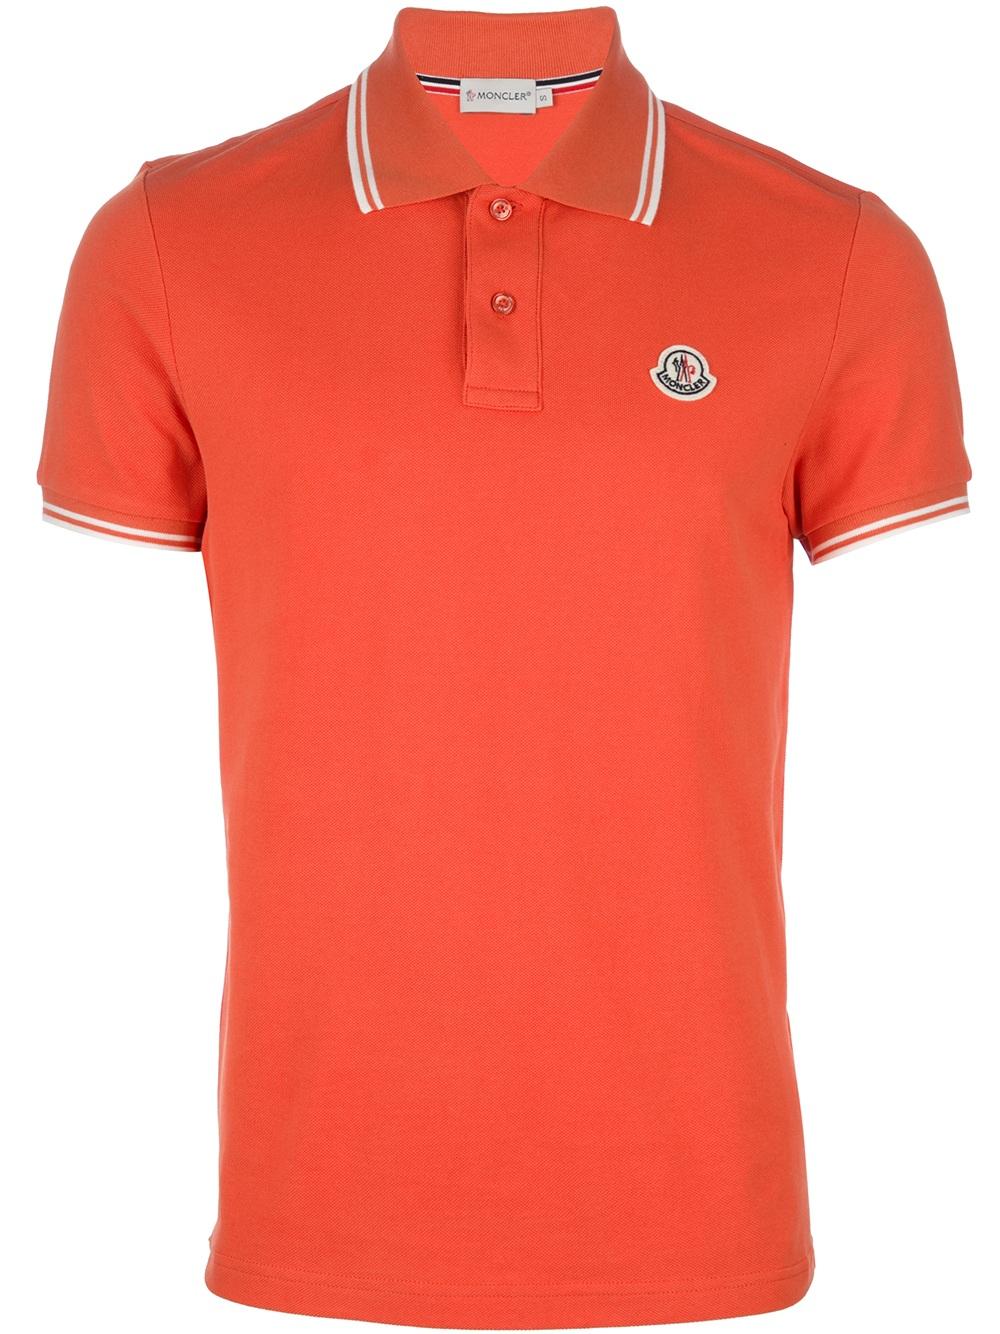 Moncler classic polo shirt in orange for men lyst for Orange polo shirt mens